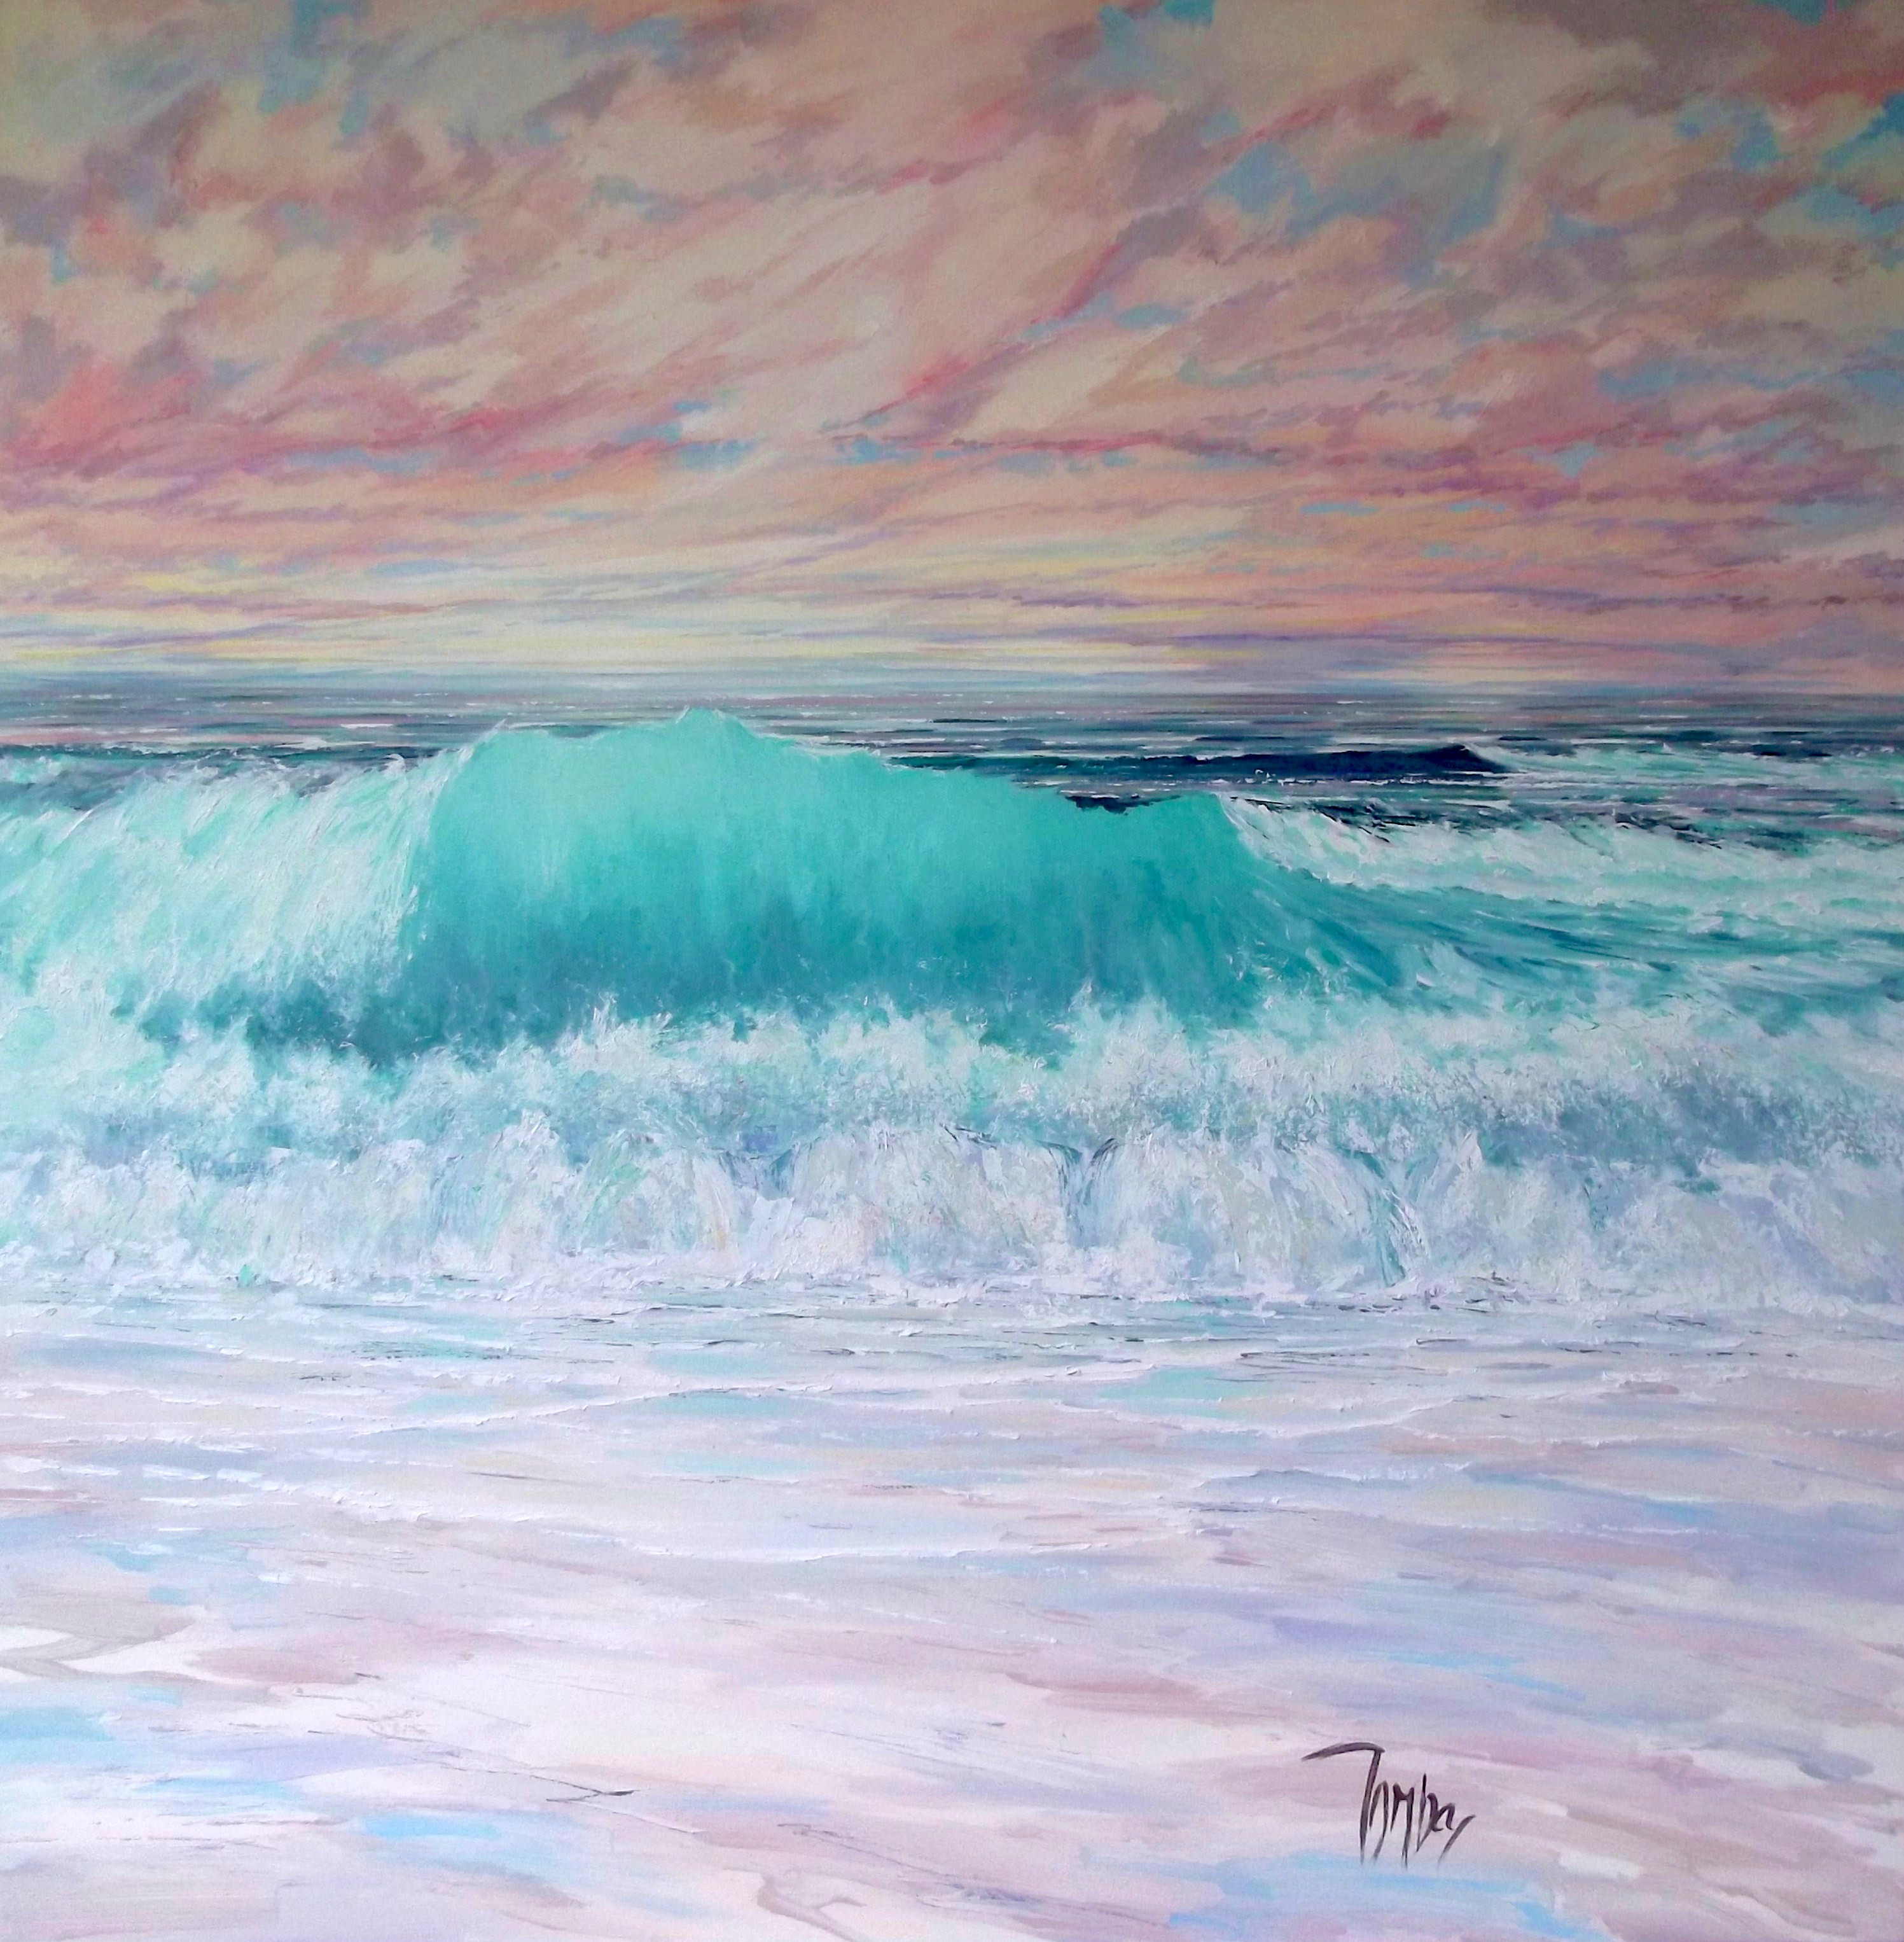 tom-barron-sunset-breakers-signet-contemporary-art